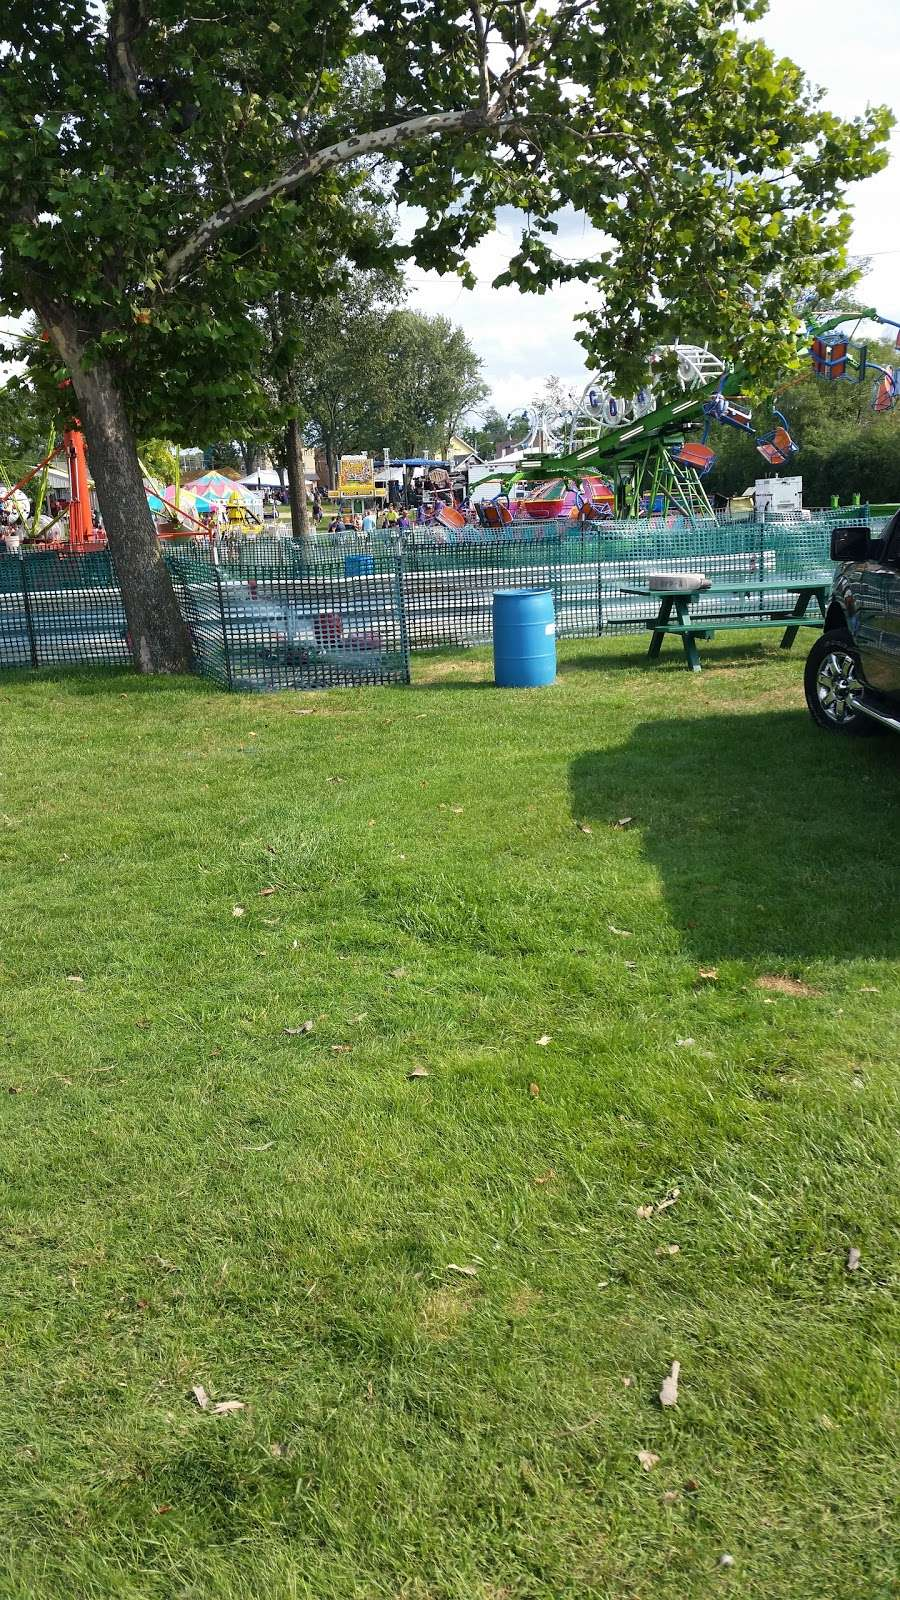 Lehmann Park - park  | Photo 3 of 10 | Address: 89 Cedar Ave, Lake Villa, IL 60046, USA | Phone: (847) 356-6100